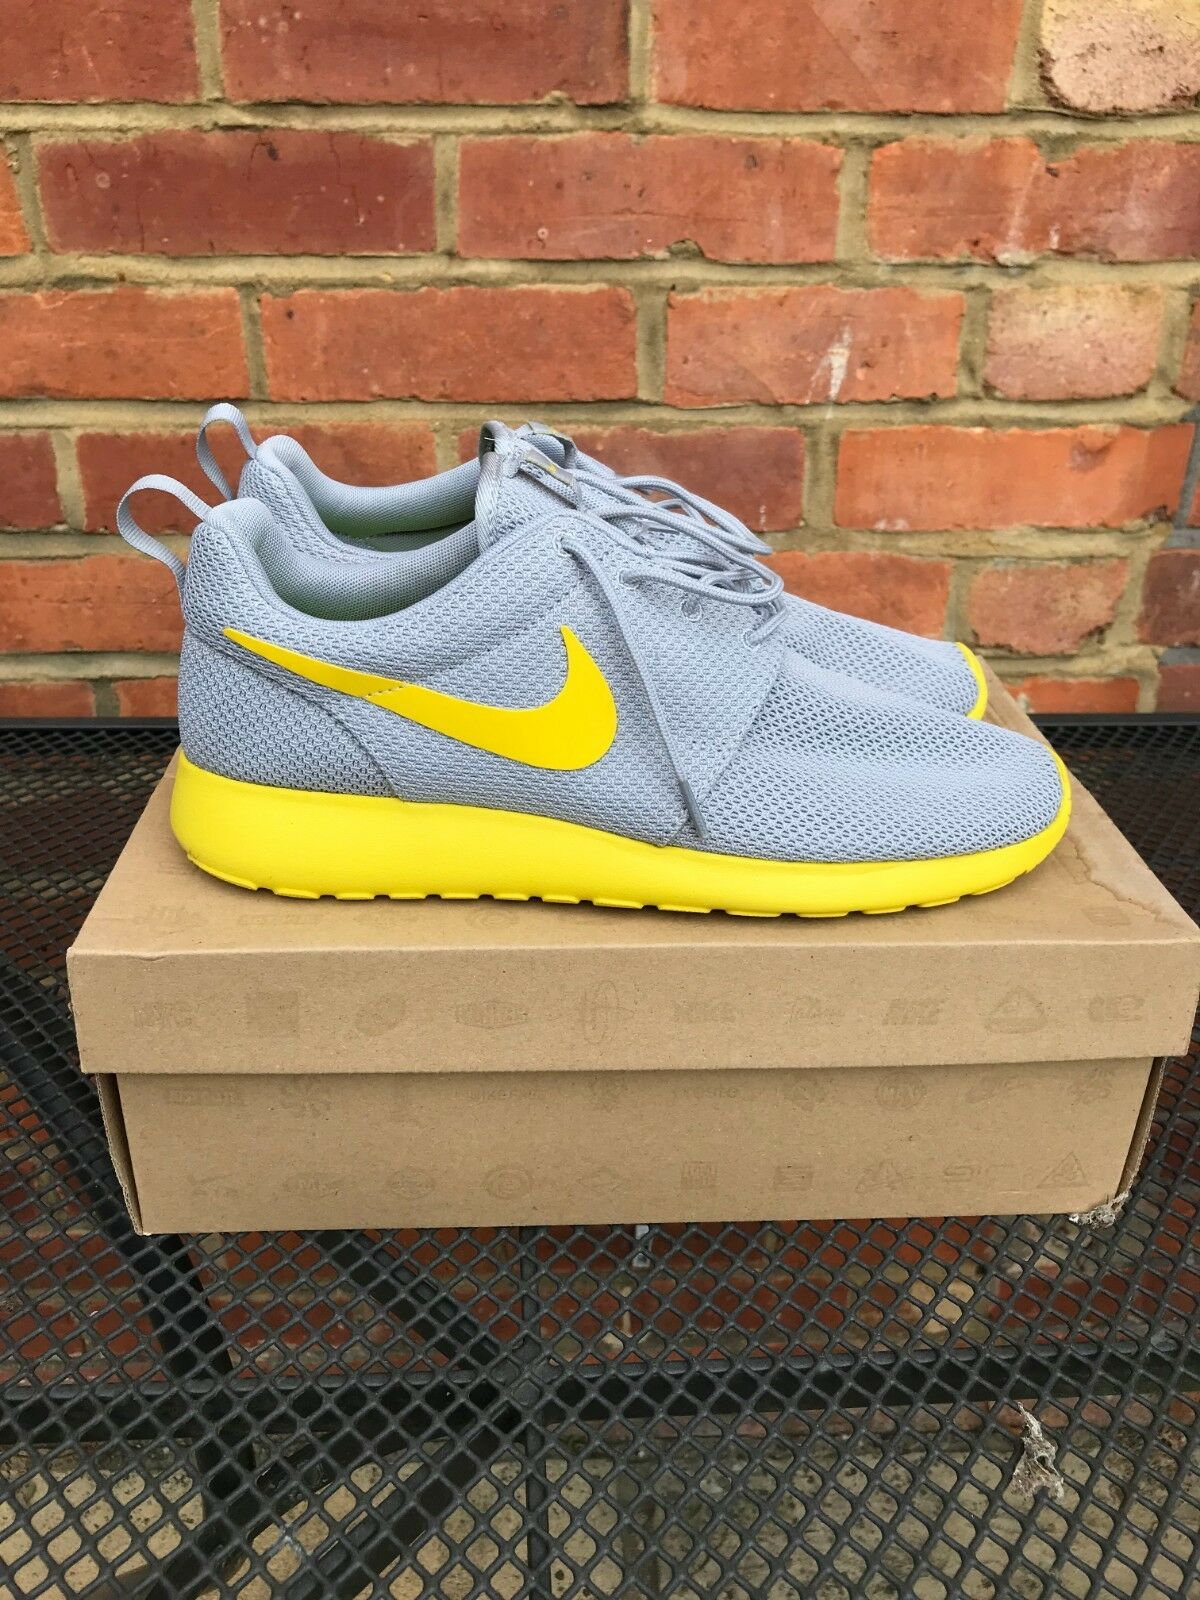 Nike Roshe Run Cool Yellow9.5  Gris  Yellow9.5 Cool VNDS e61234